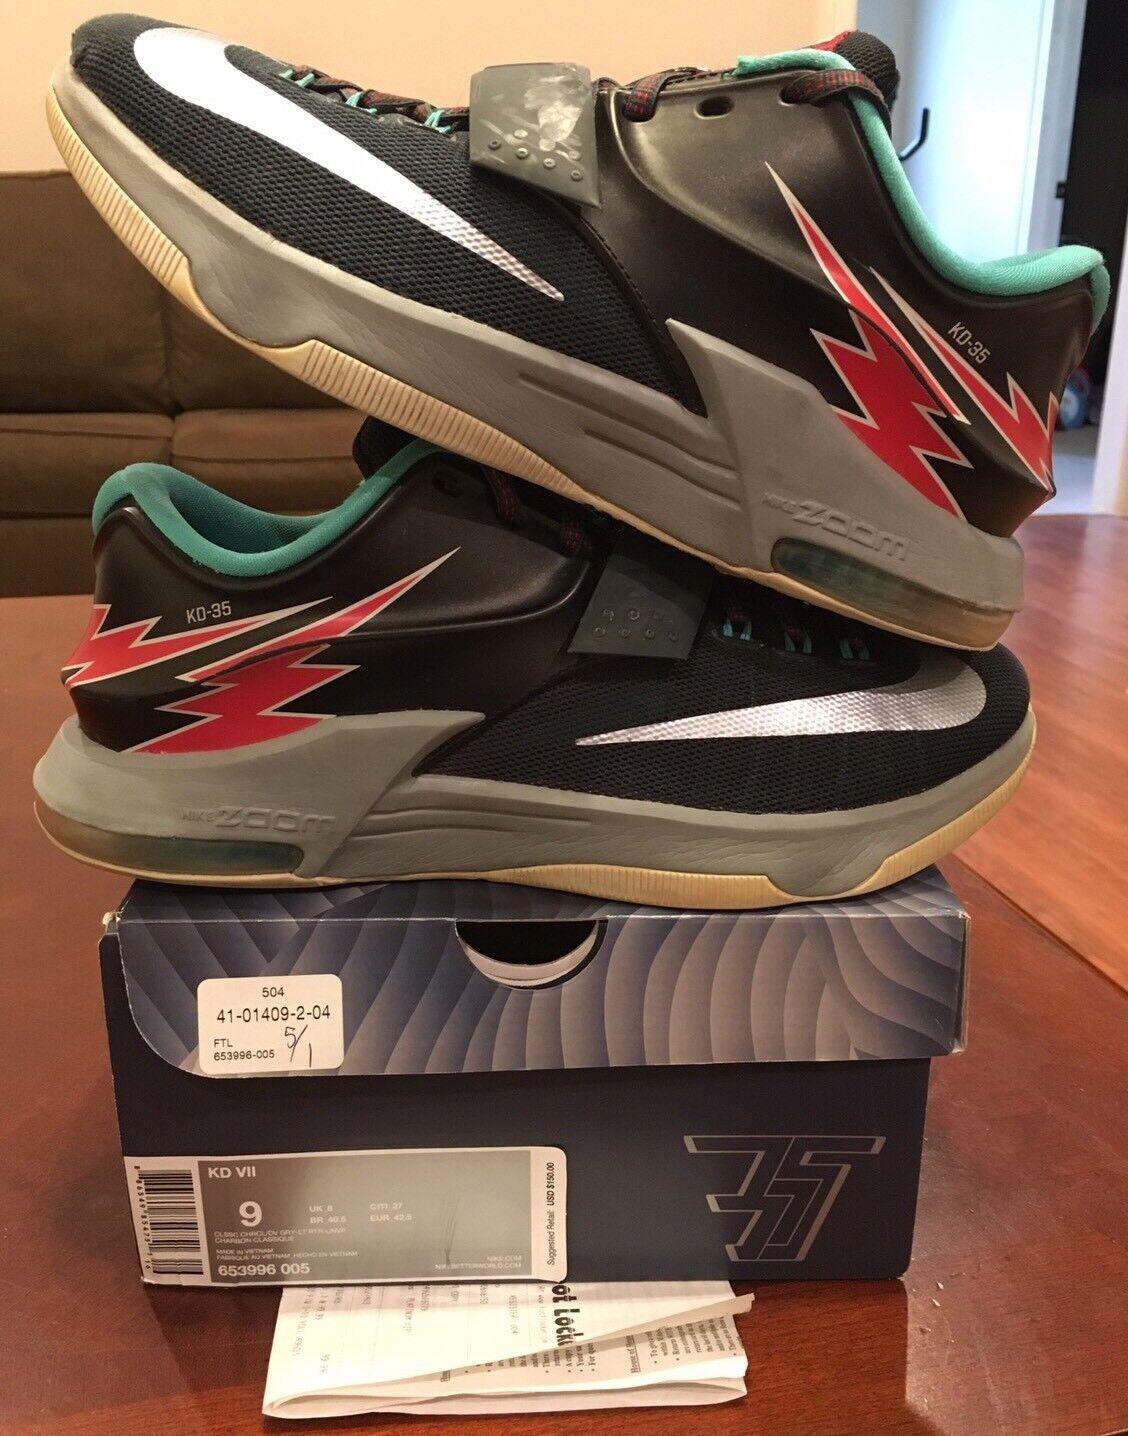 Nike kd 7 vii thunderbolt volo jordan yeezy durant 2 3 4 5 6 9 10 slancio lotto 8